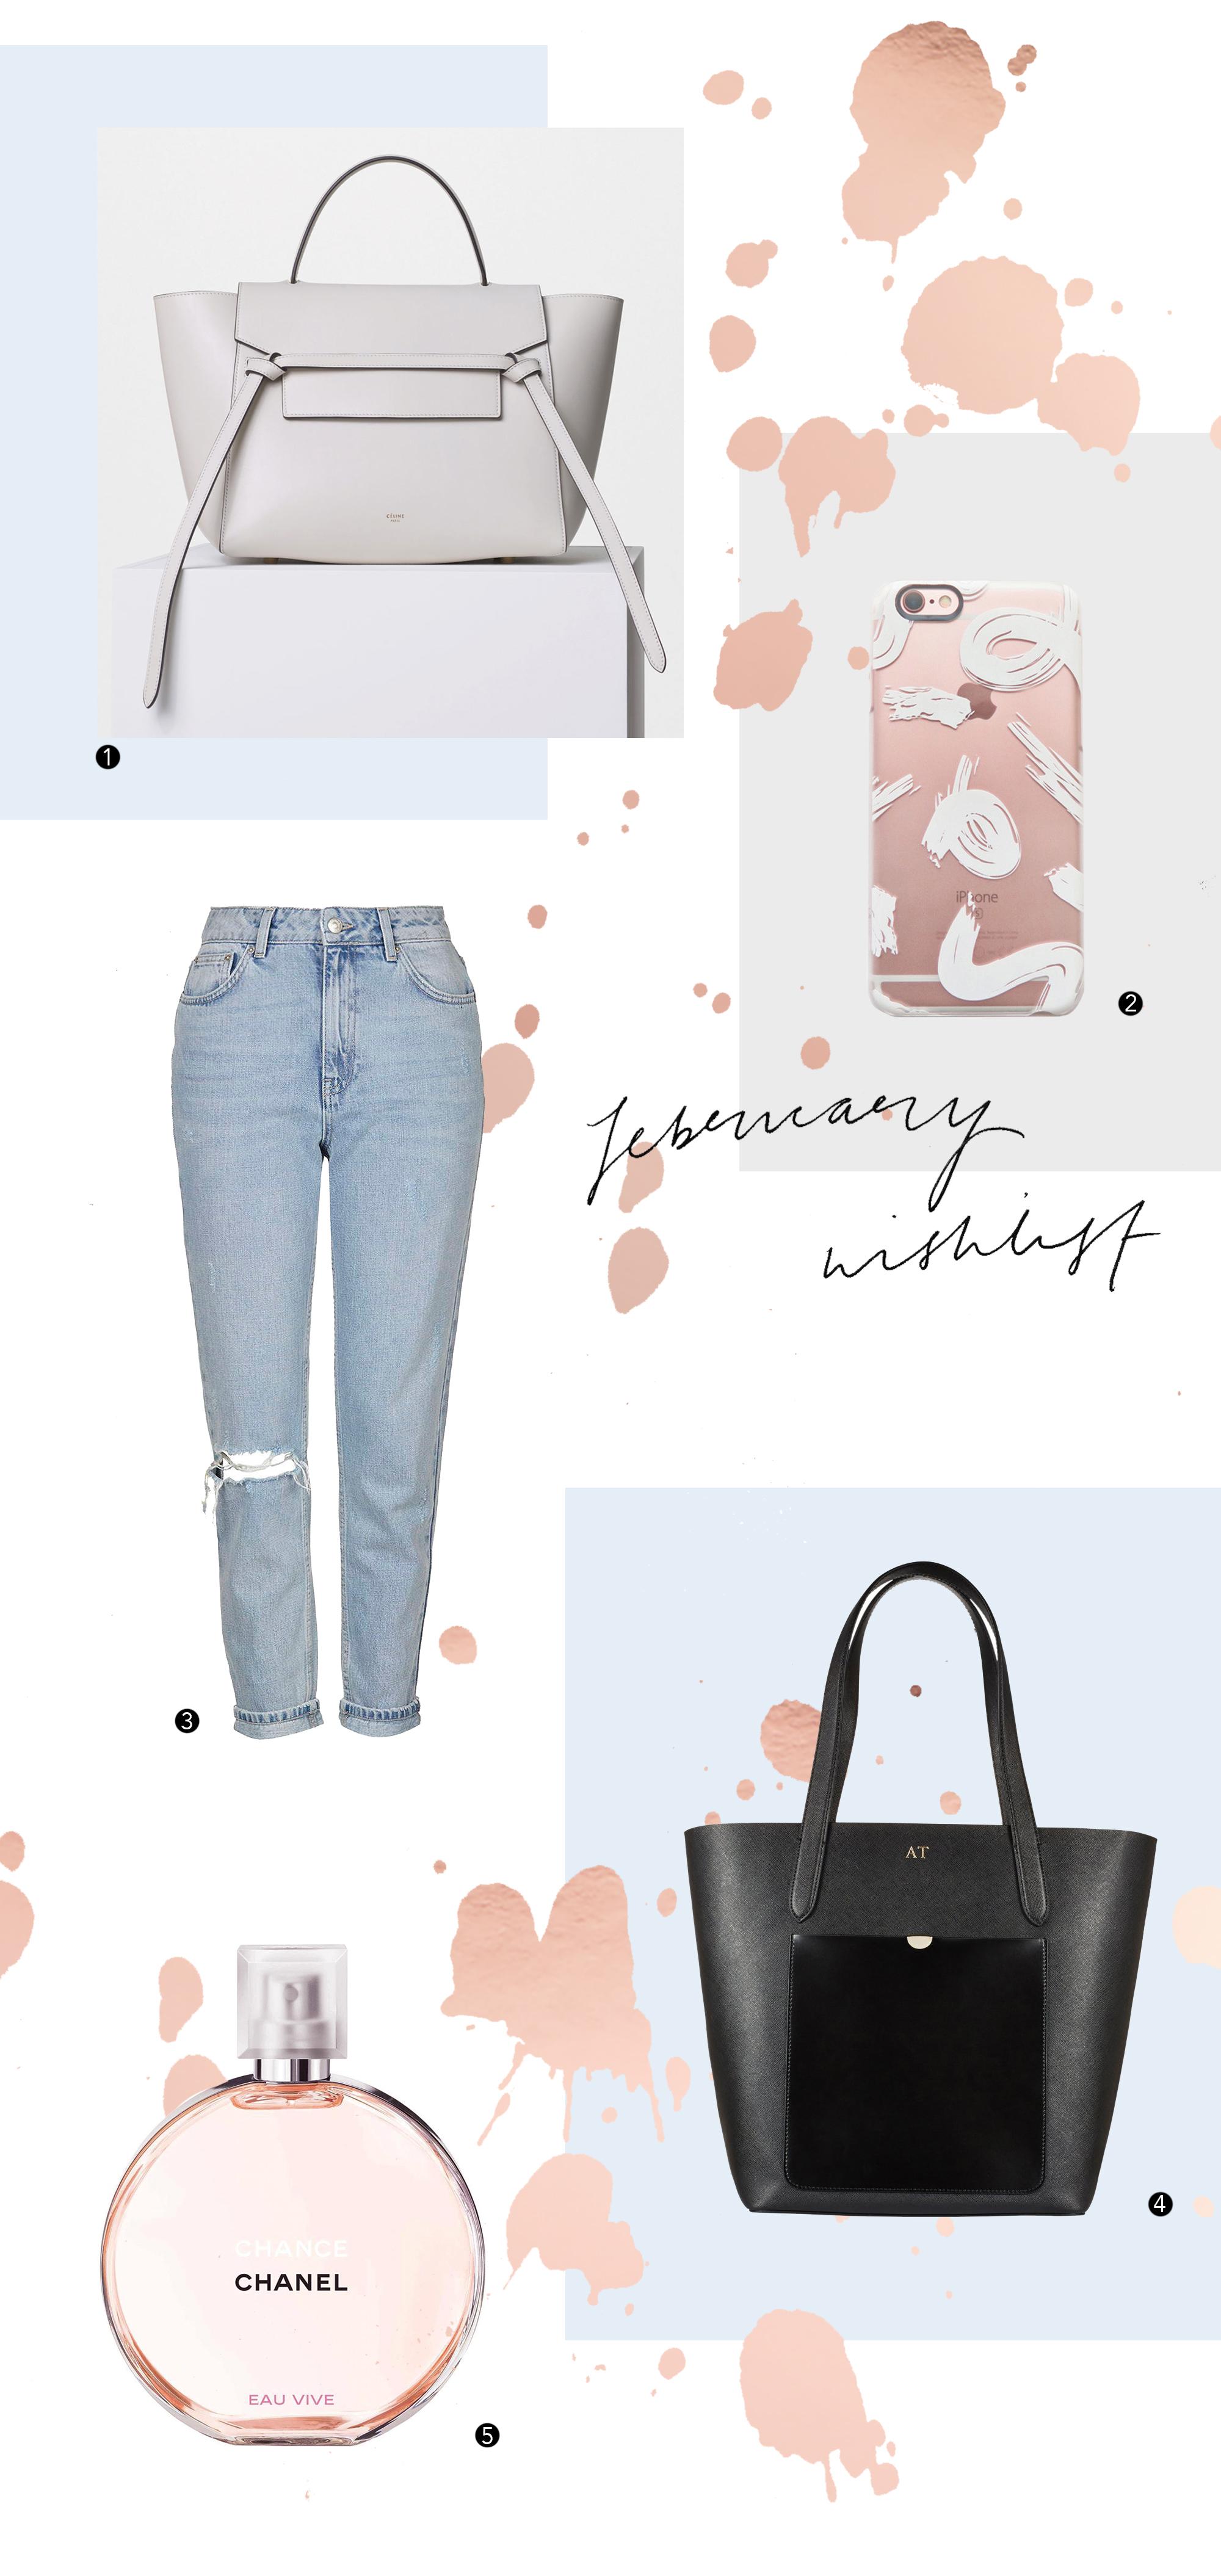 February 2016 Wish List